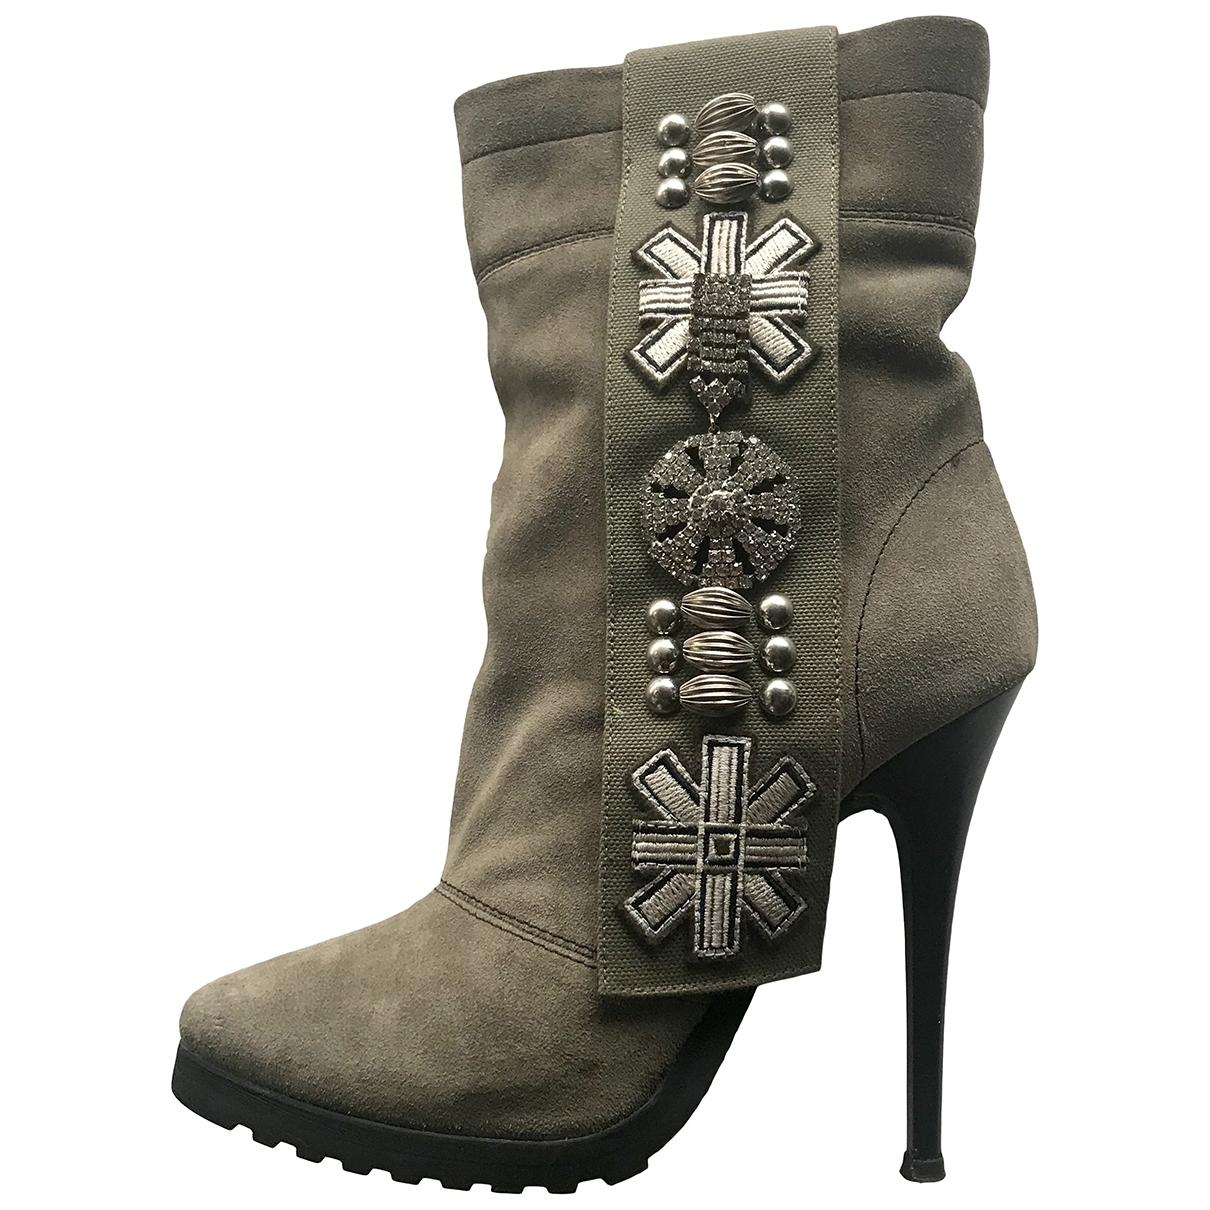 Giuseppe Zanotti \N Khaki Suede Ankle boots for Women 38 IT